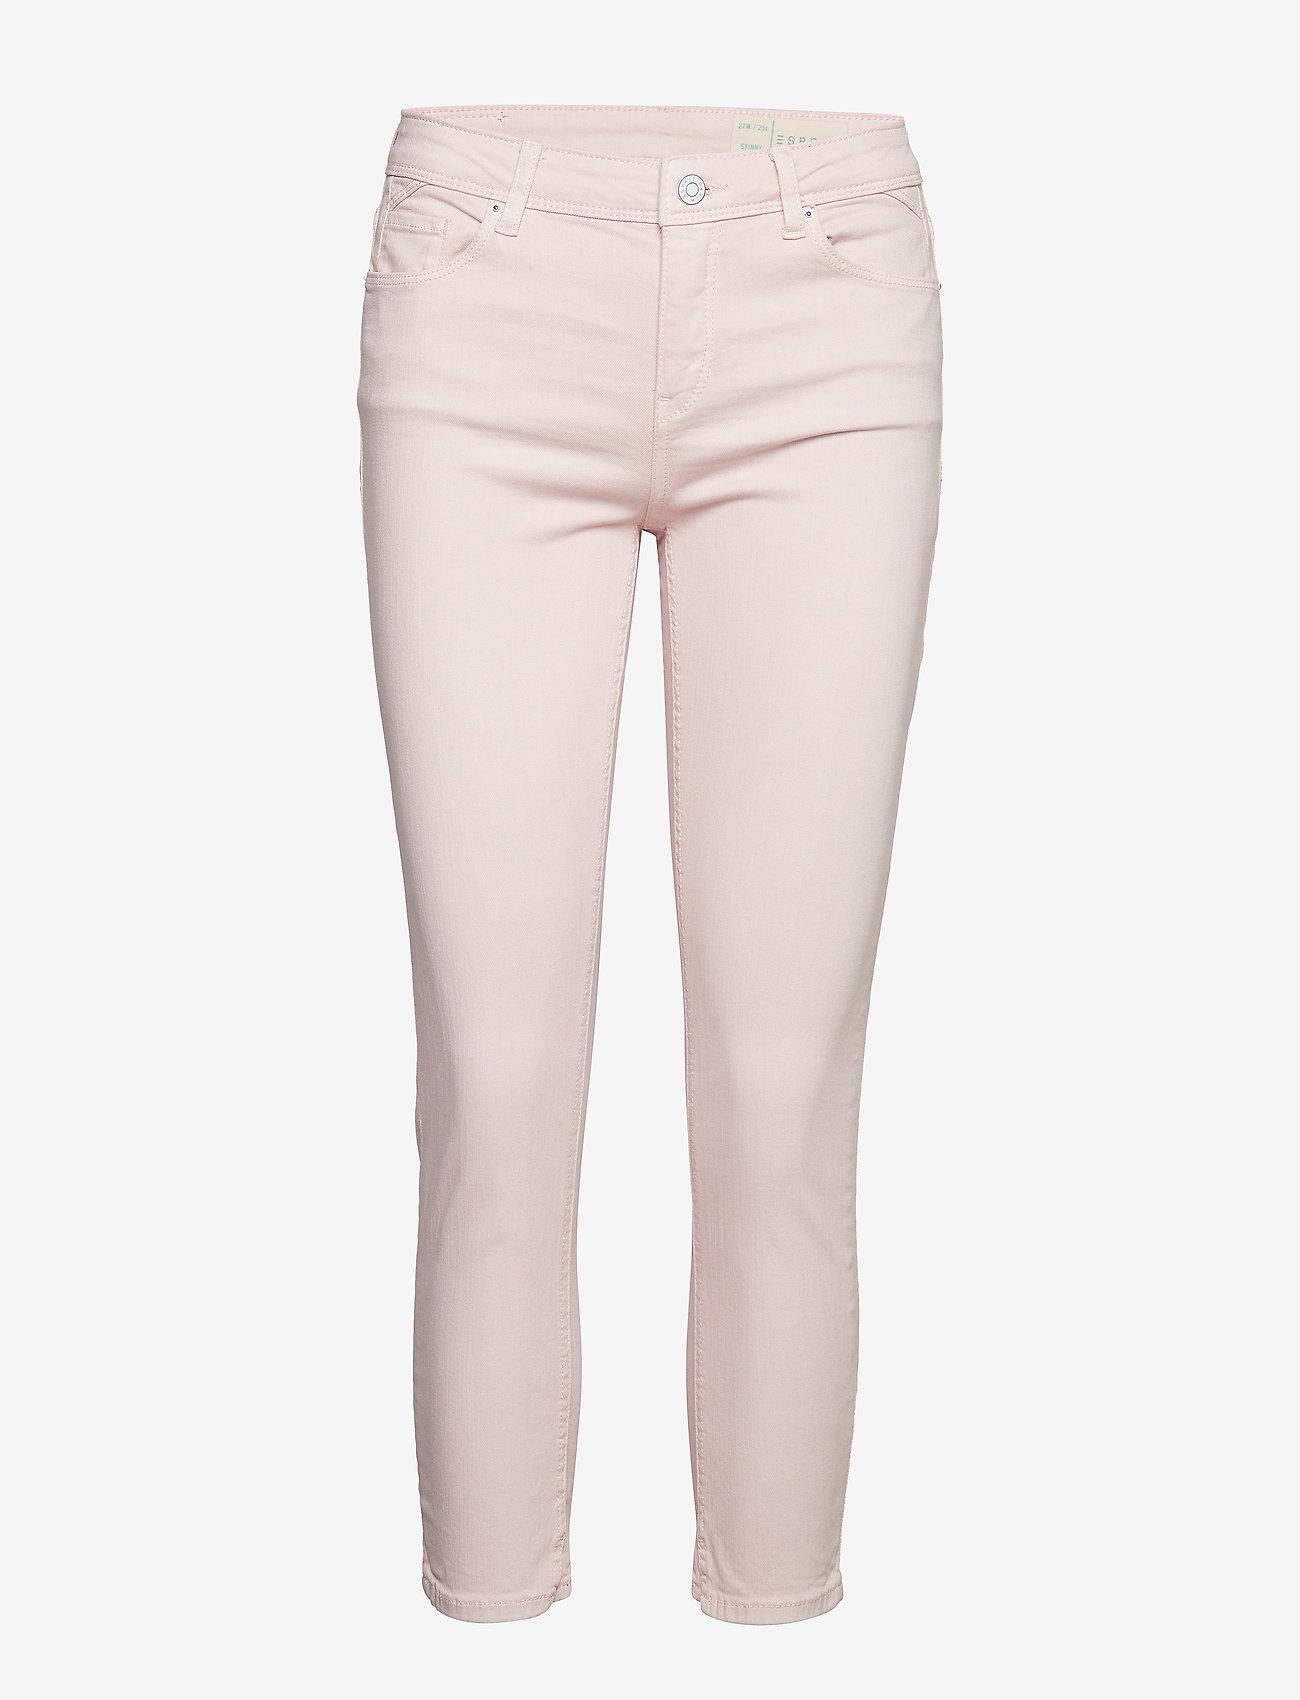 Esprit Casual - Pants denim - skinny jeans - light pink - 0